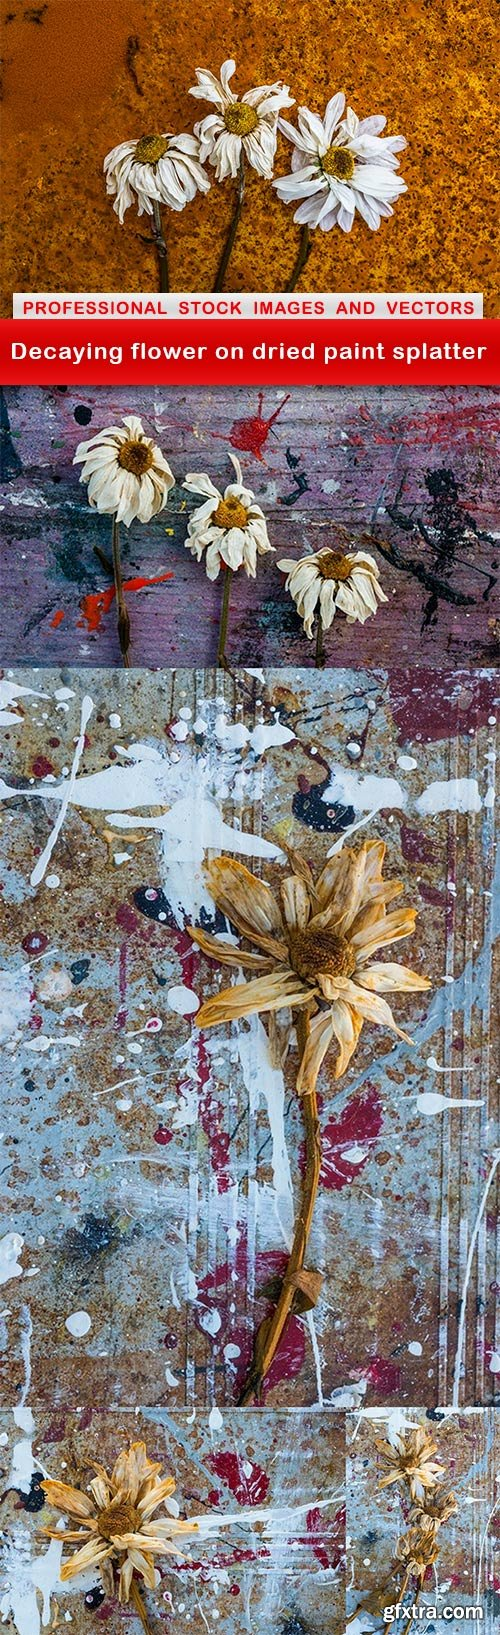 Decaying flower on dried paint splatter - 5 UHQ JPEG